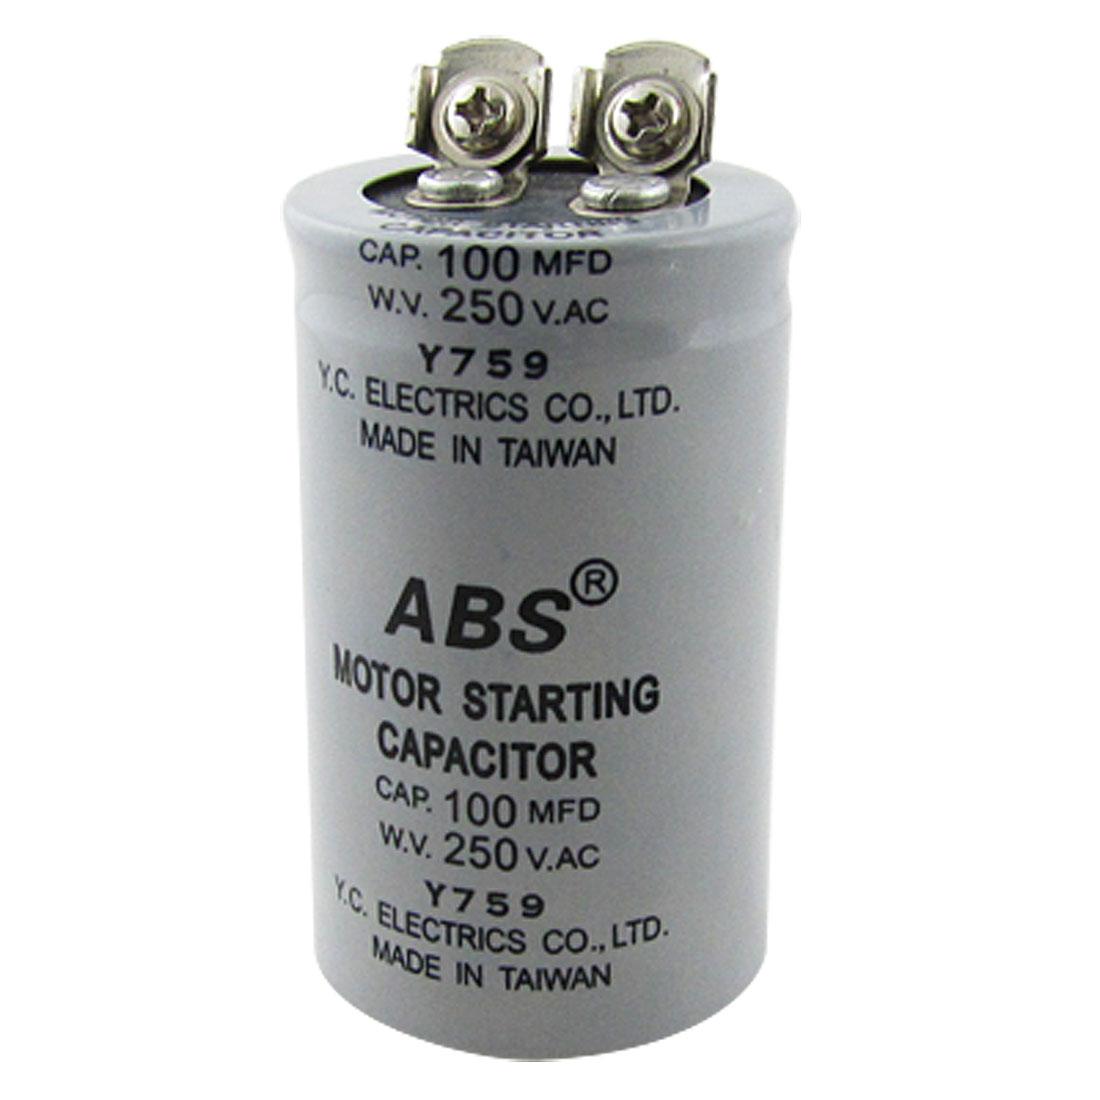 ABS 100MFD 100uF 250V AC Motor Starting Capacitor